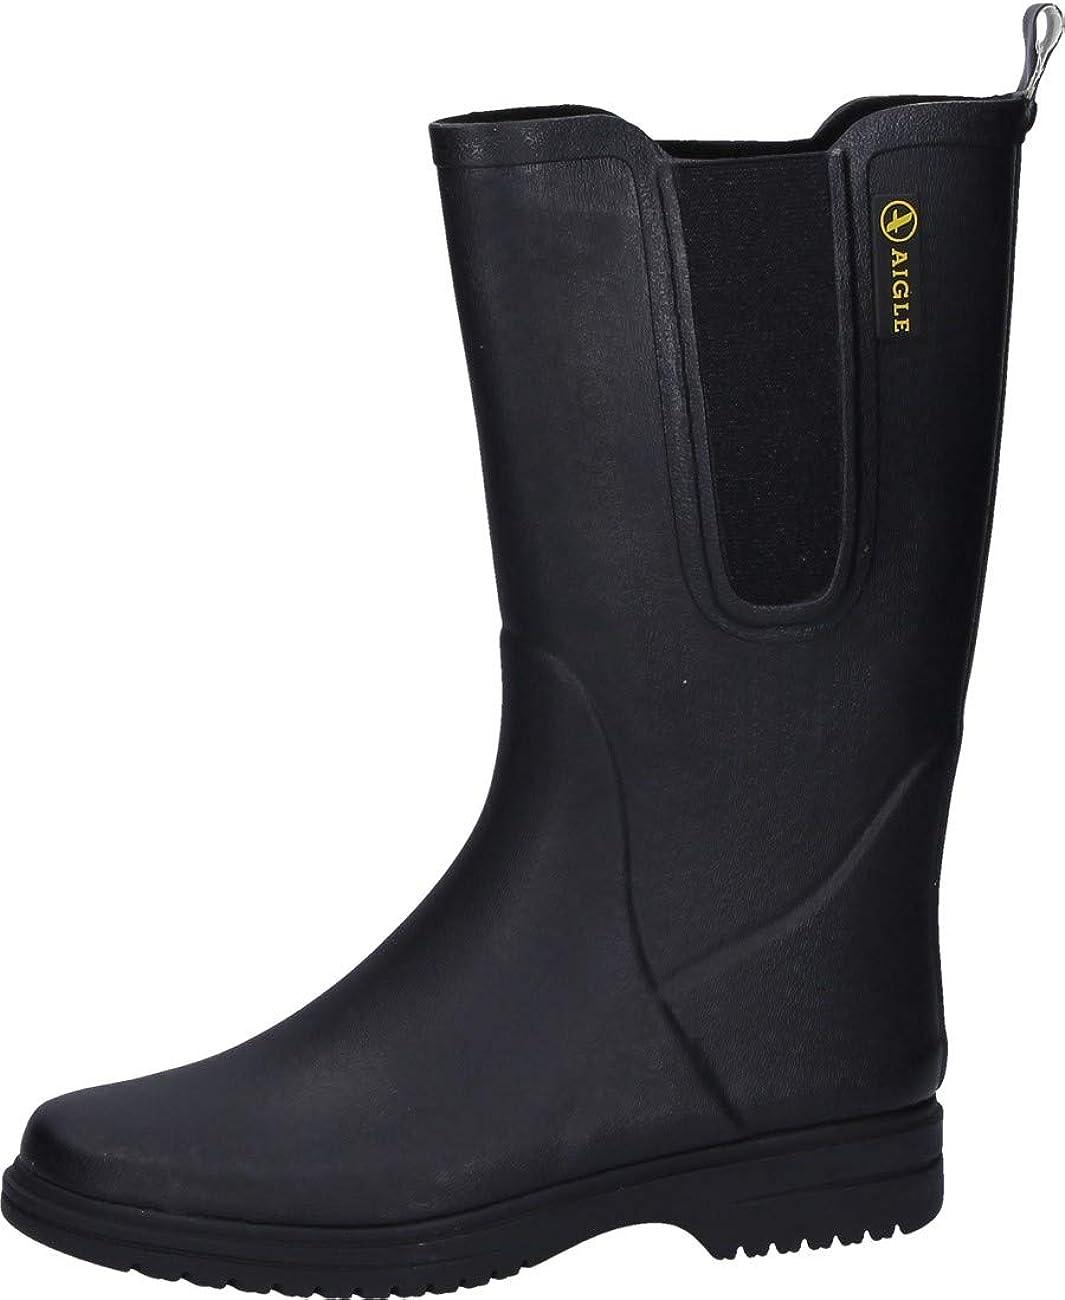 Aigle Women's Work Wellington Boots